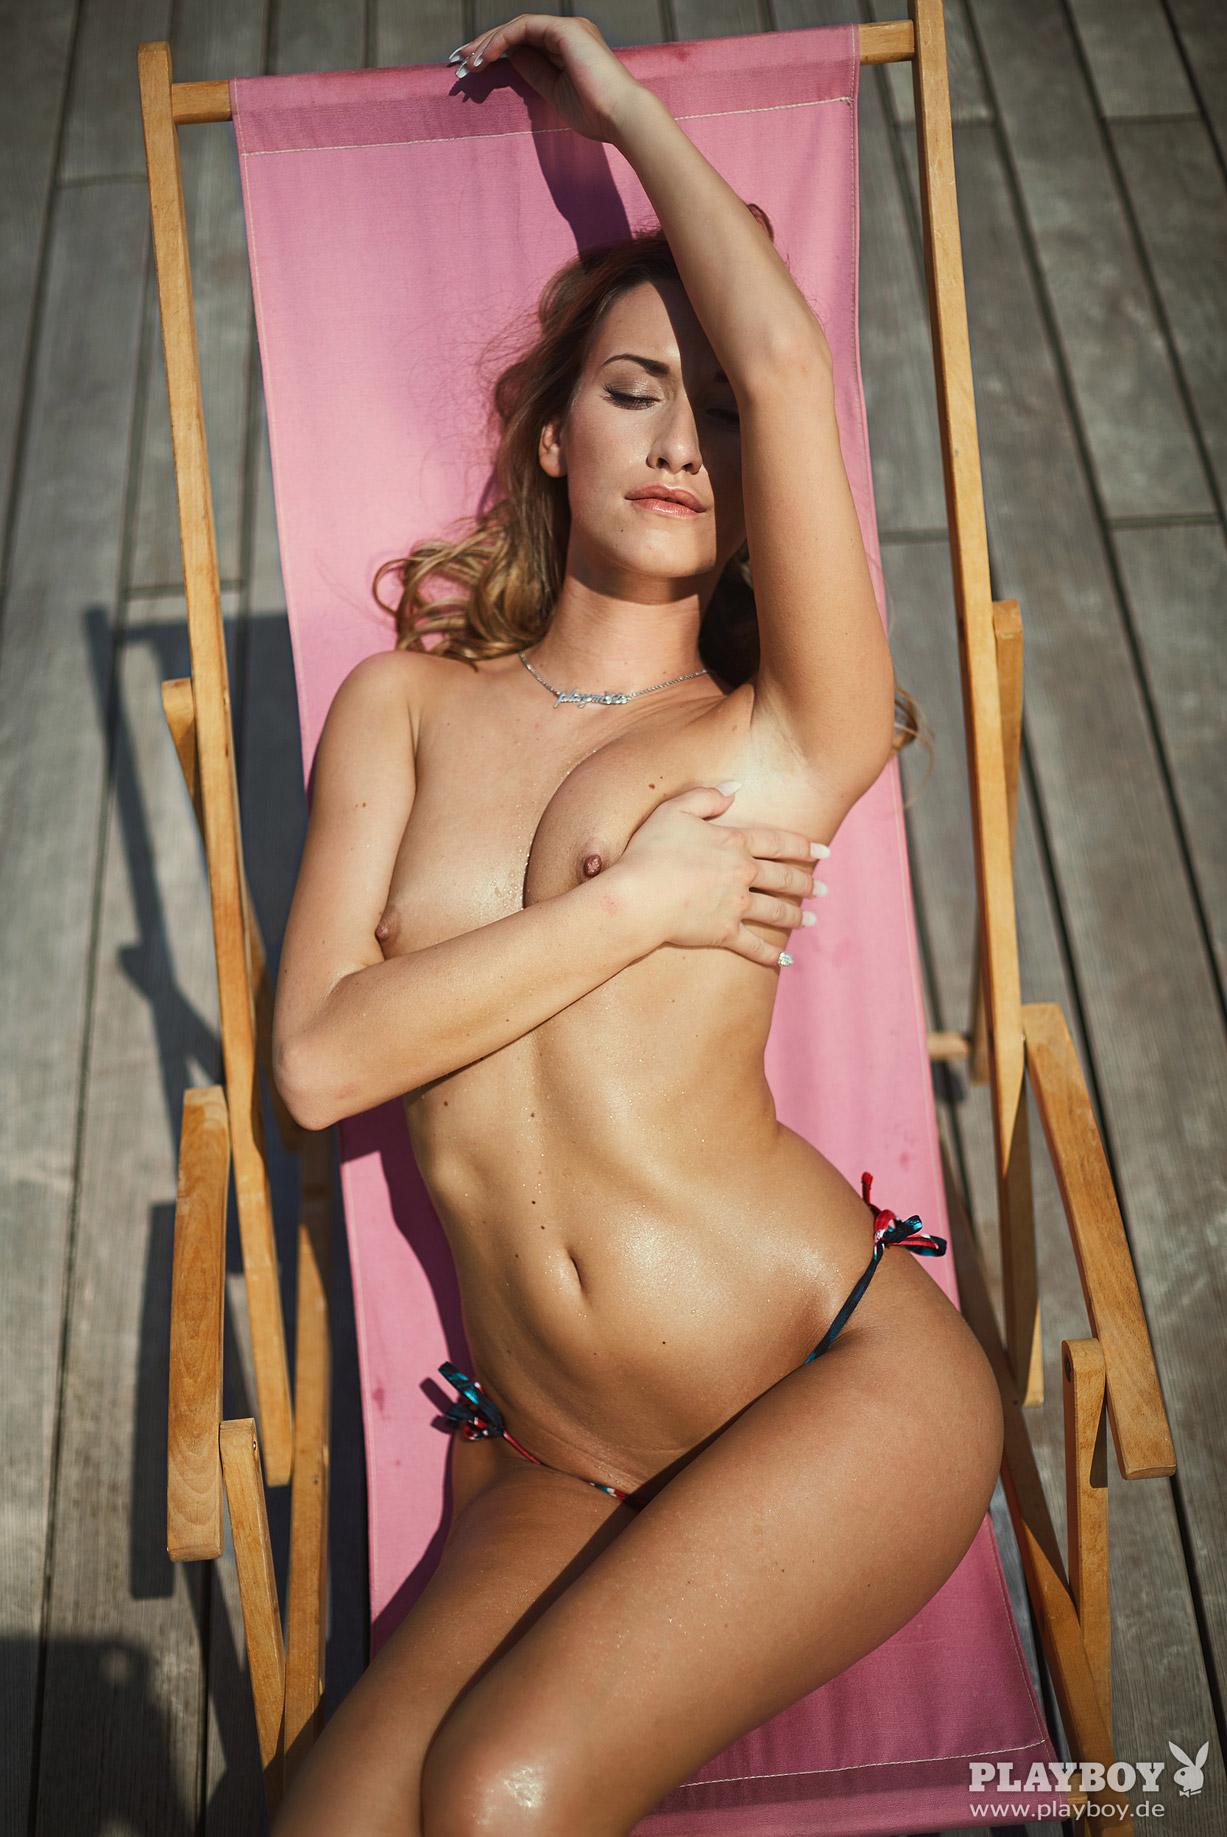 Девушка месяца Штефани Балк / Stefanie Balk - Playboy Germany august 2016 playmate